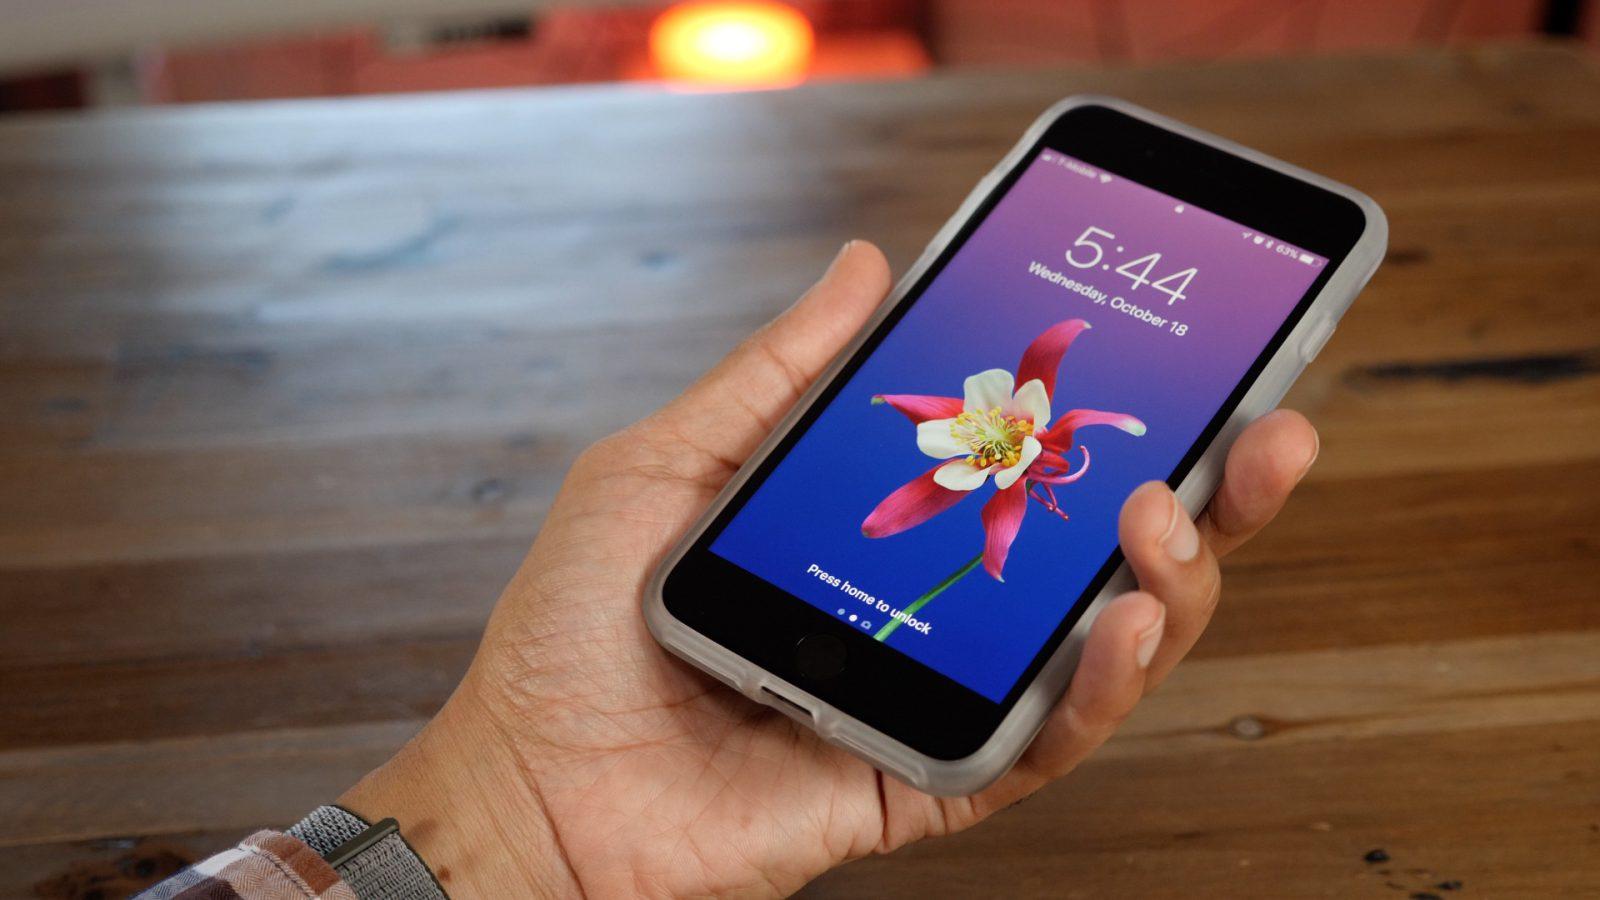 Coque iPhone 8 en silicone ou en plastique ?